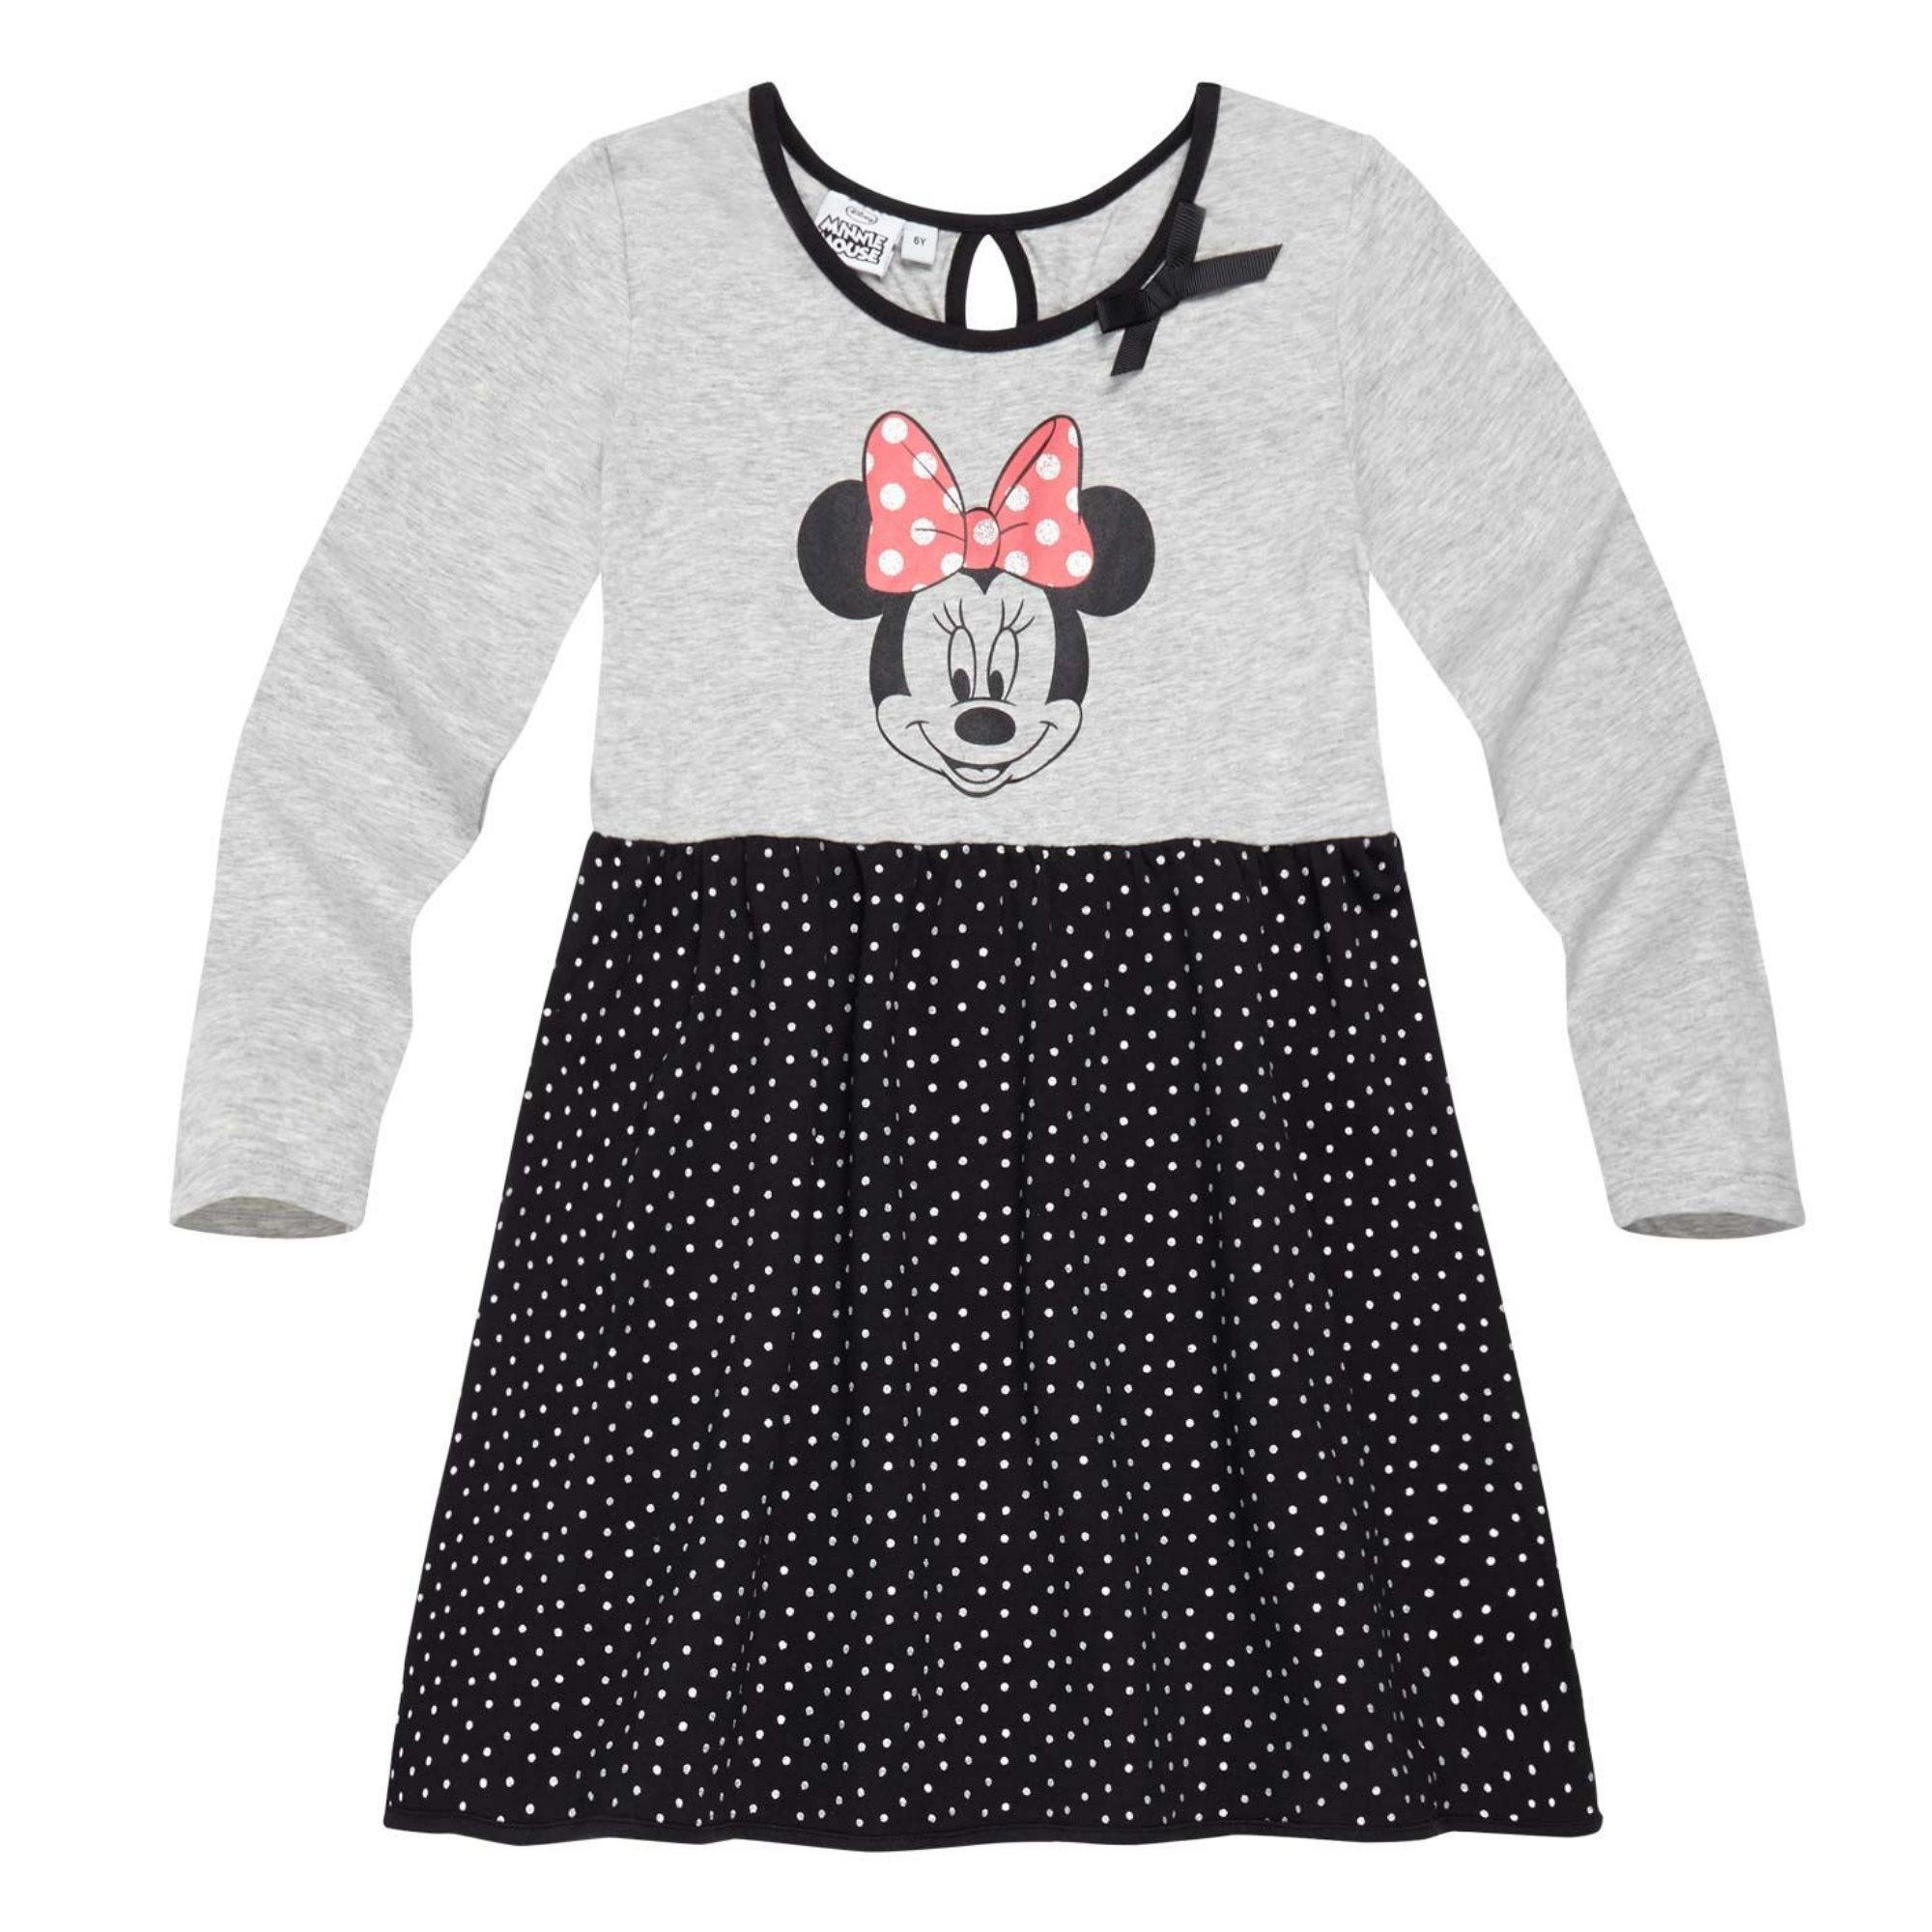 Disney Minnie Und Kindermode KleidLangarm Rainbowpalace Baby SzpjqULVMG